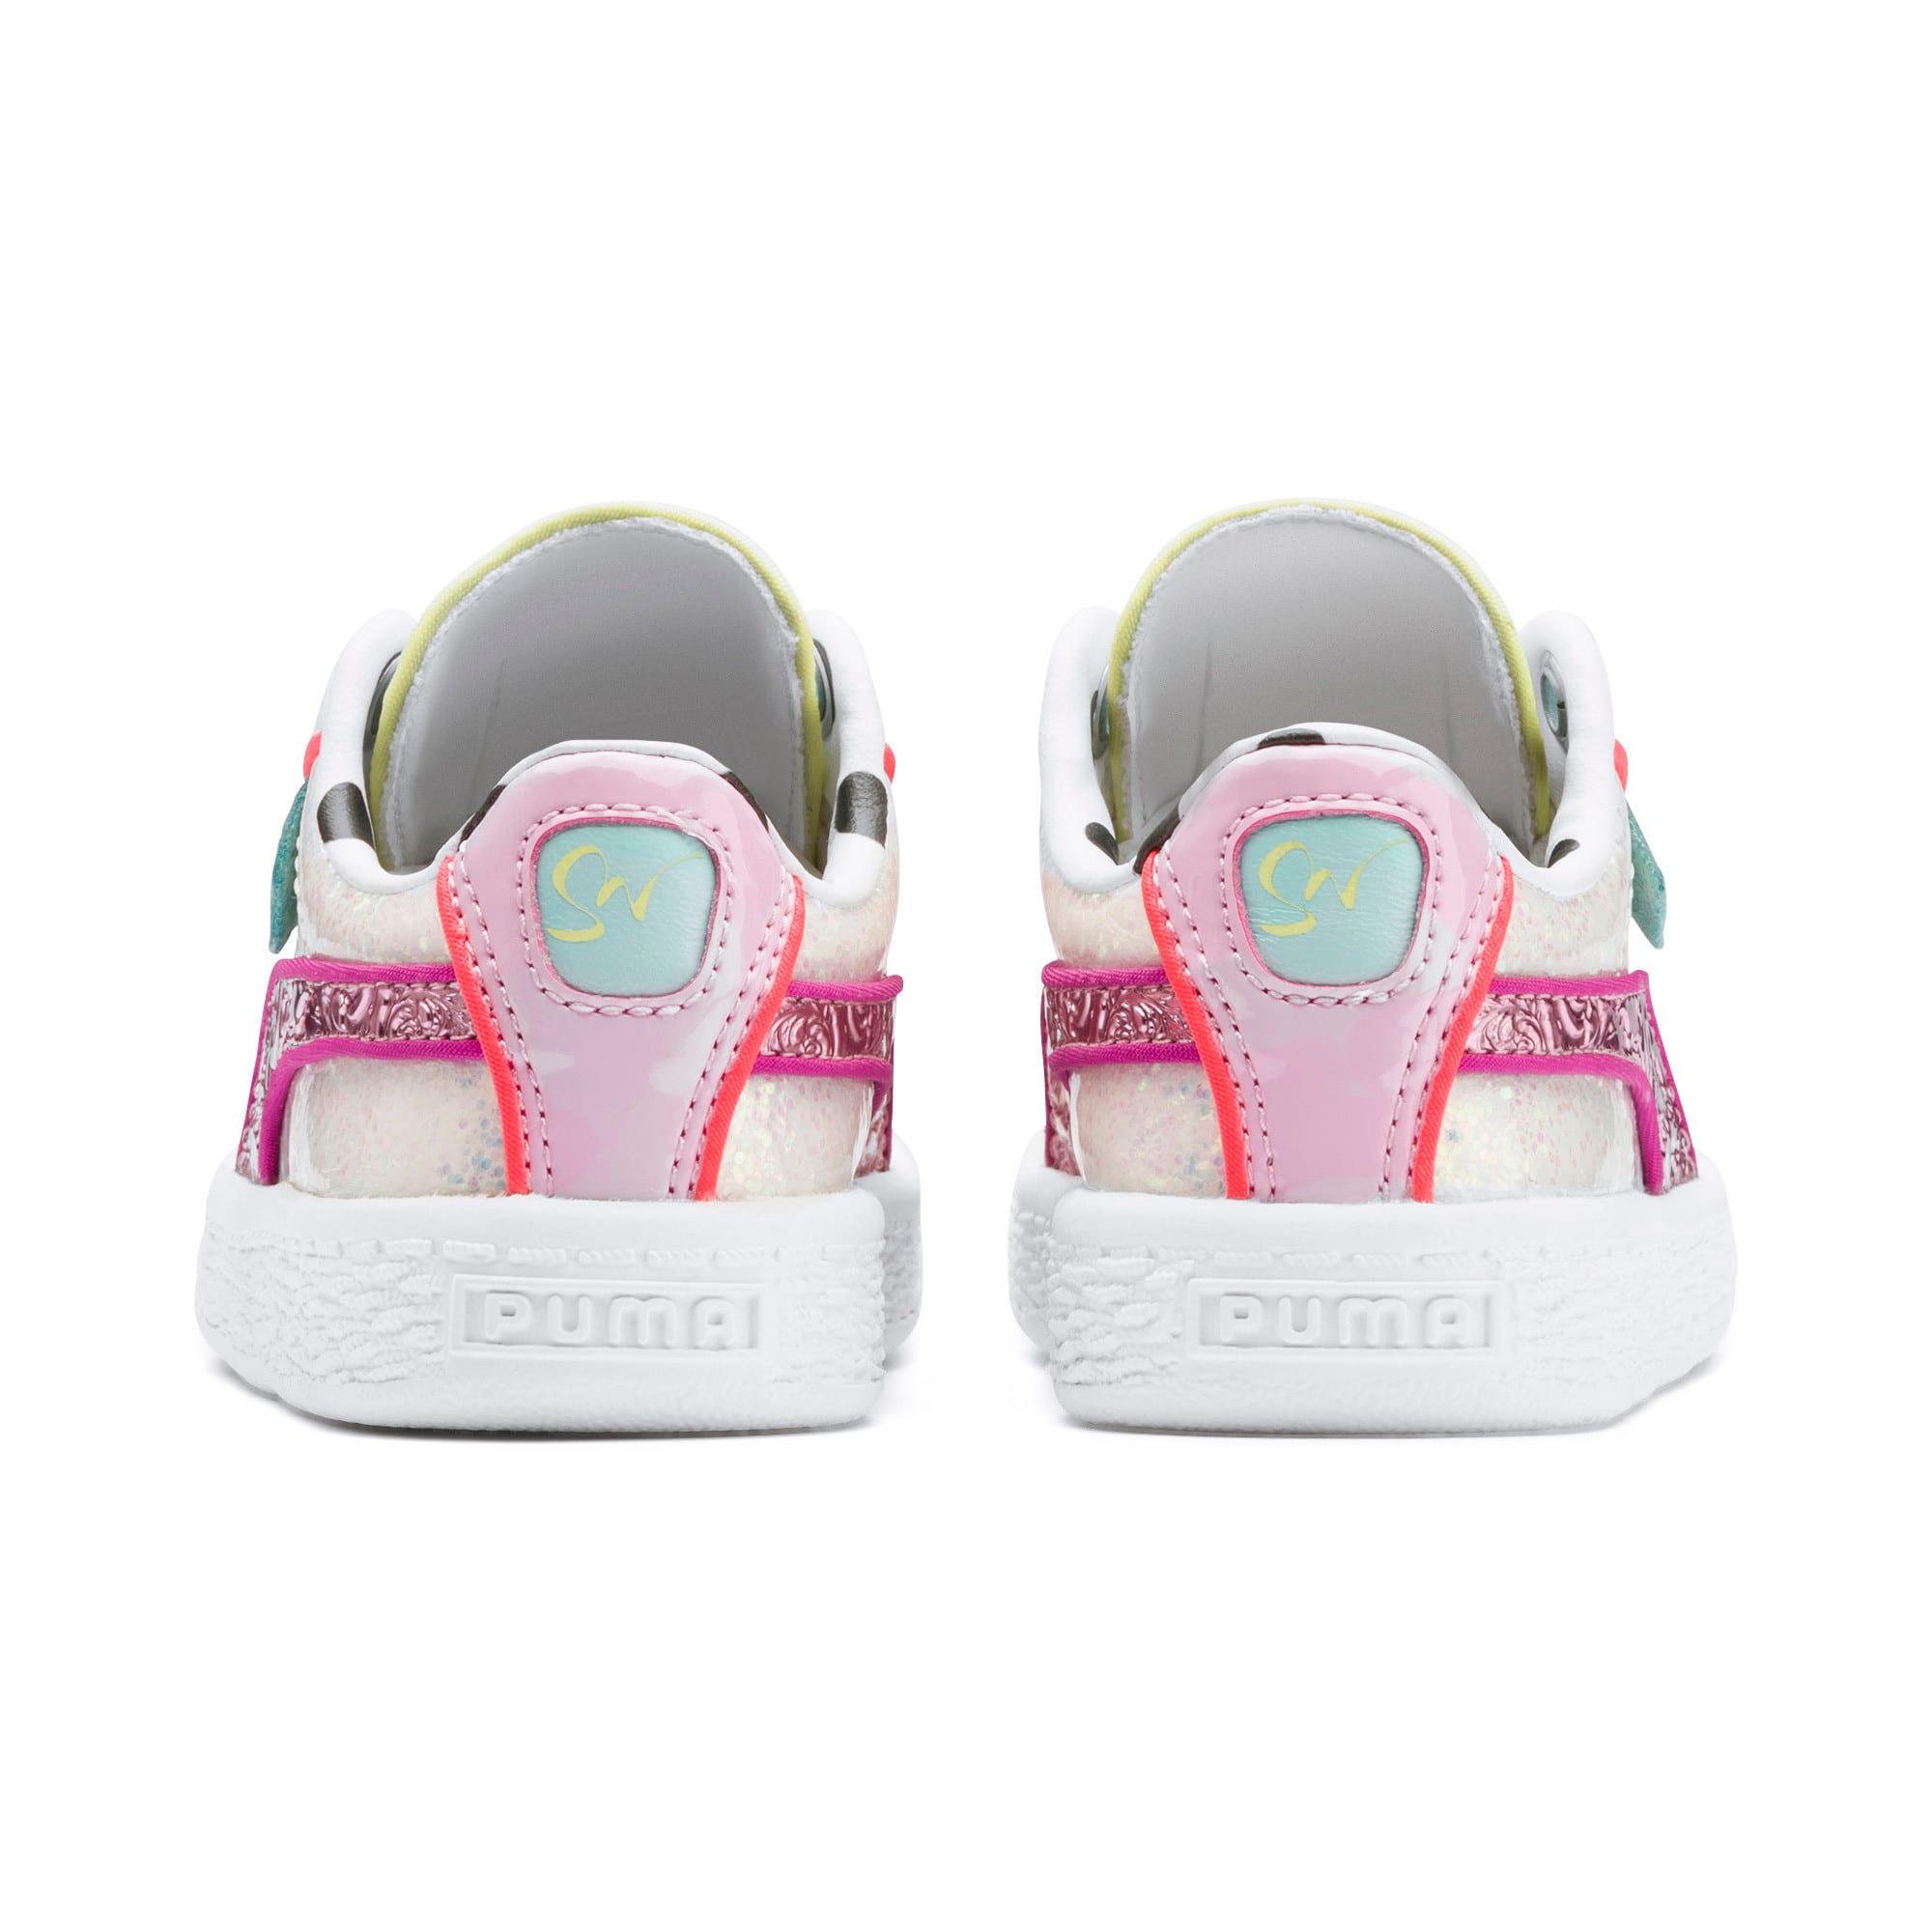 Thumbnail 3 of PUMA x SOPHIA WEBSTER Basket Toddler Shoes, Puma White-Pale Pink, medium